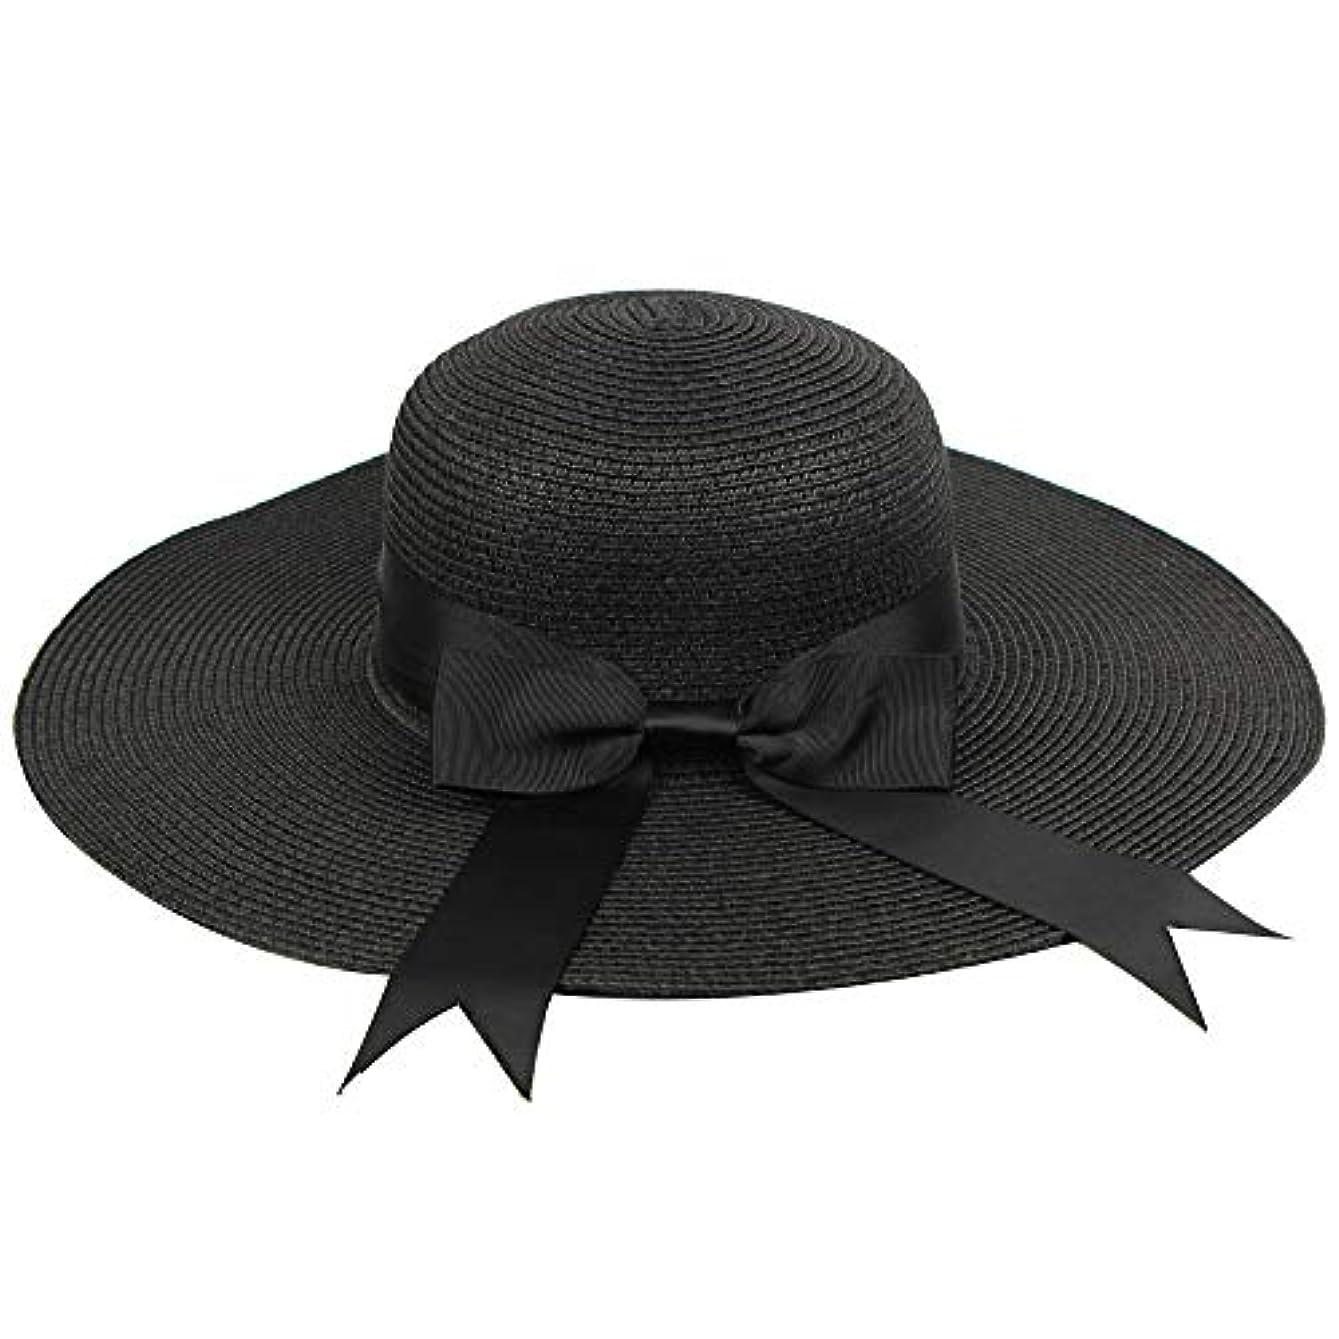 UVカット 帽子 ハット レディース 紫外線対策 日焼け防止 軽量 熱中症予防 取り外すあご紐 つば広 おしゃれ 広幅 小顔効果抜群 折りたたみ サイズ調節可 旅行 調節テープ 吸汗通気 紫外線対策 ROSE ROMAN